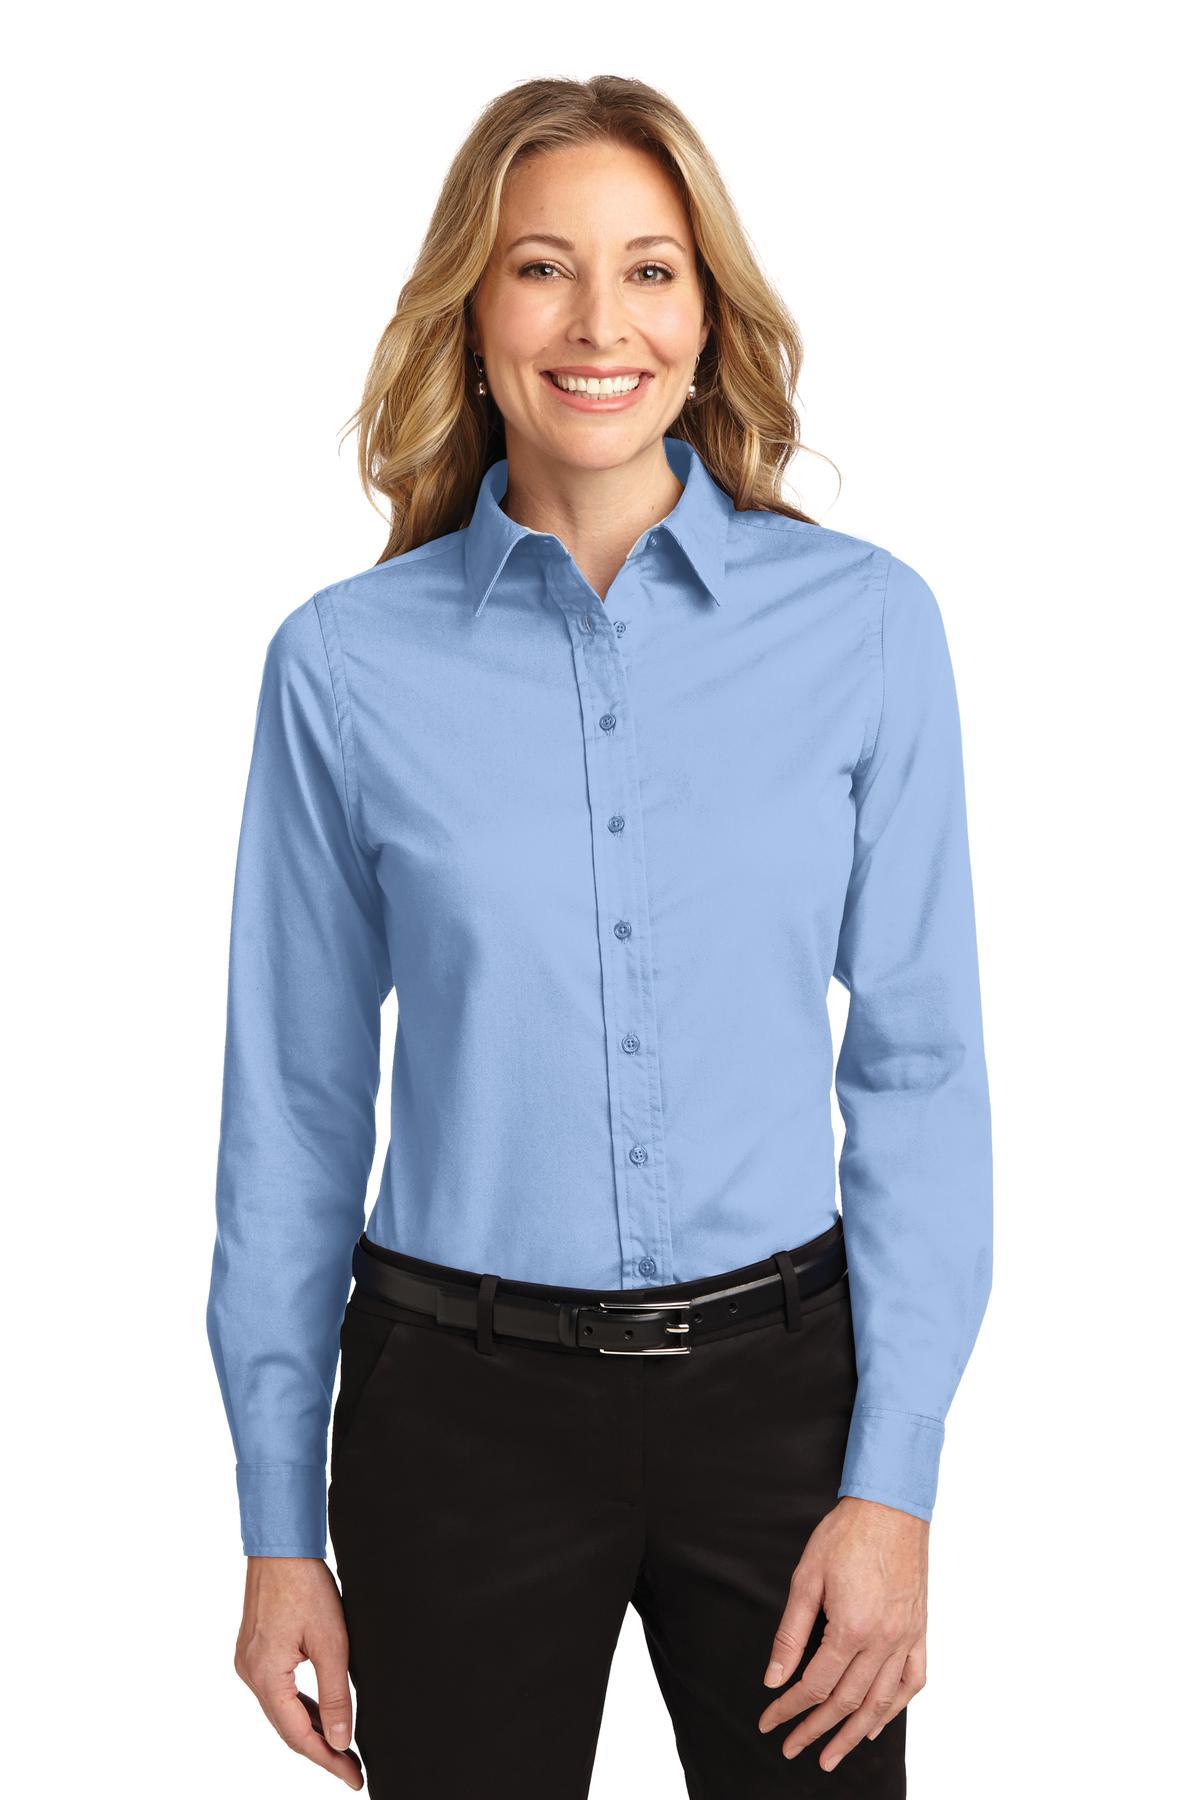 L608 Port Authority® Ladies Long Sleeve Easy Care Shirt Fenta-